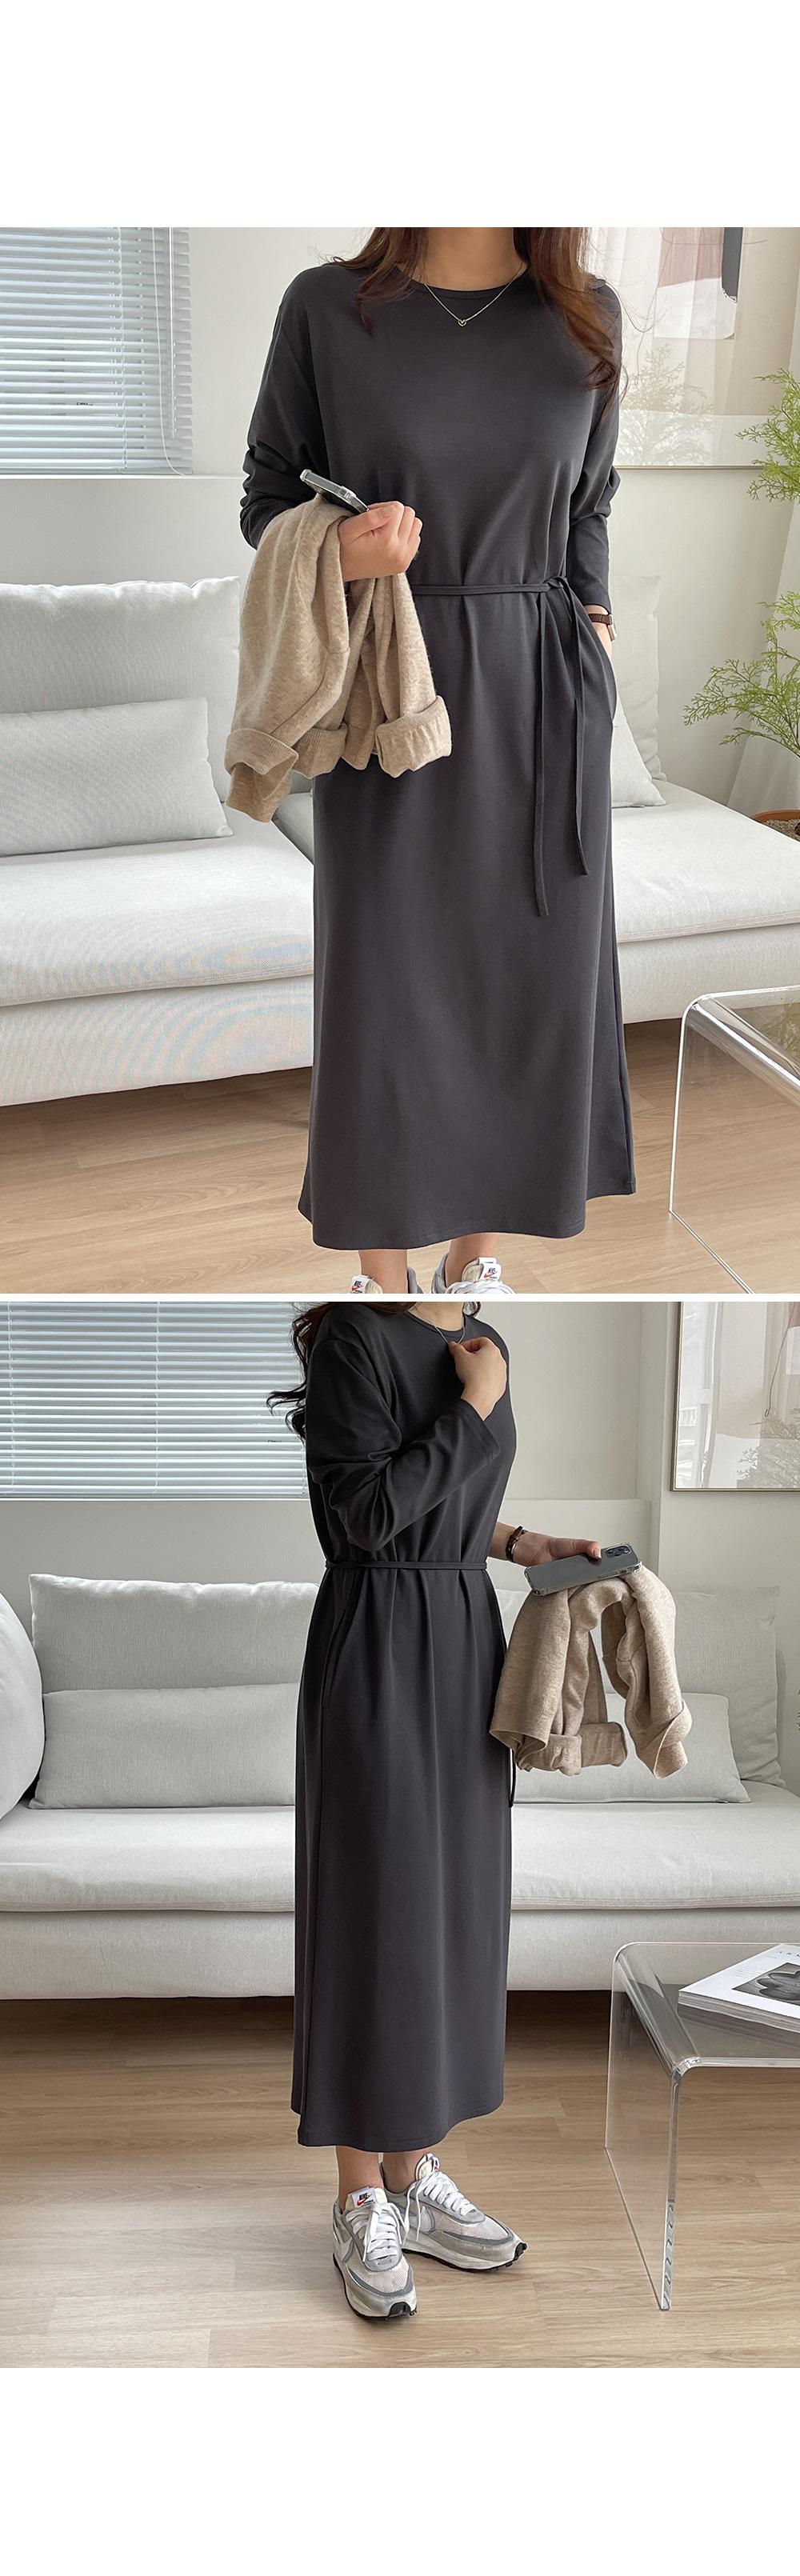 Comfort Stretch Tunic dress-holiholic.com